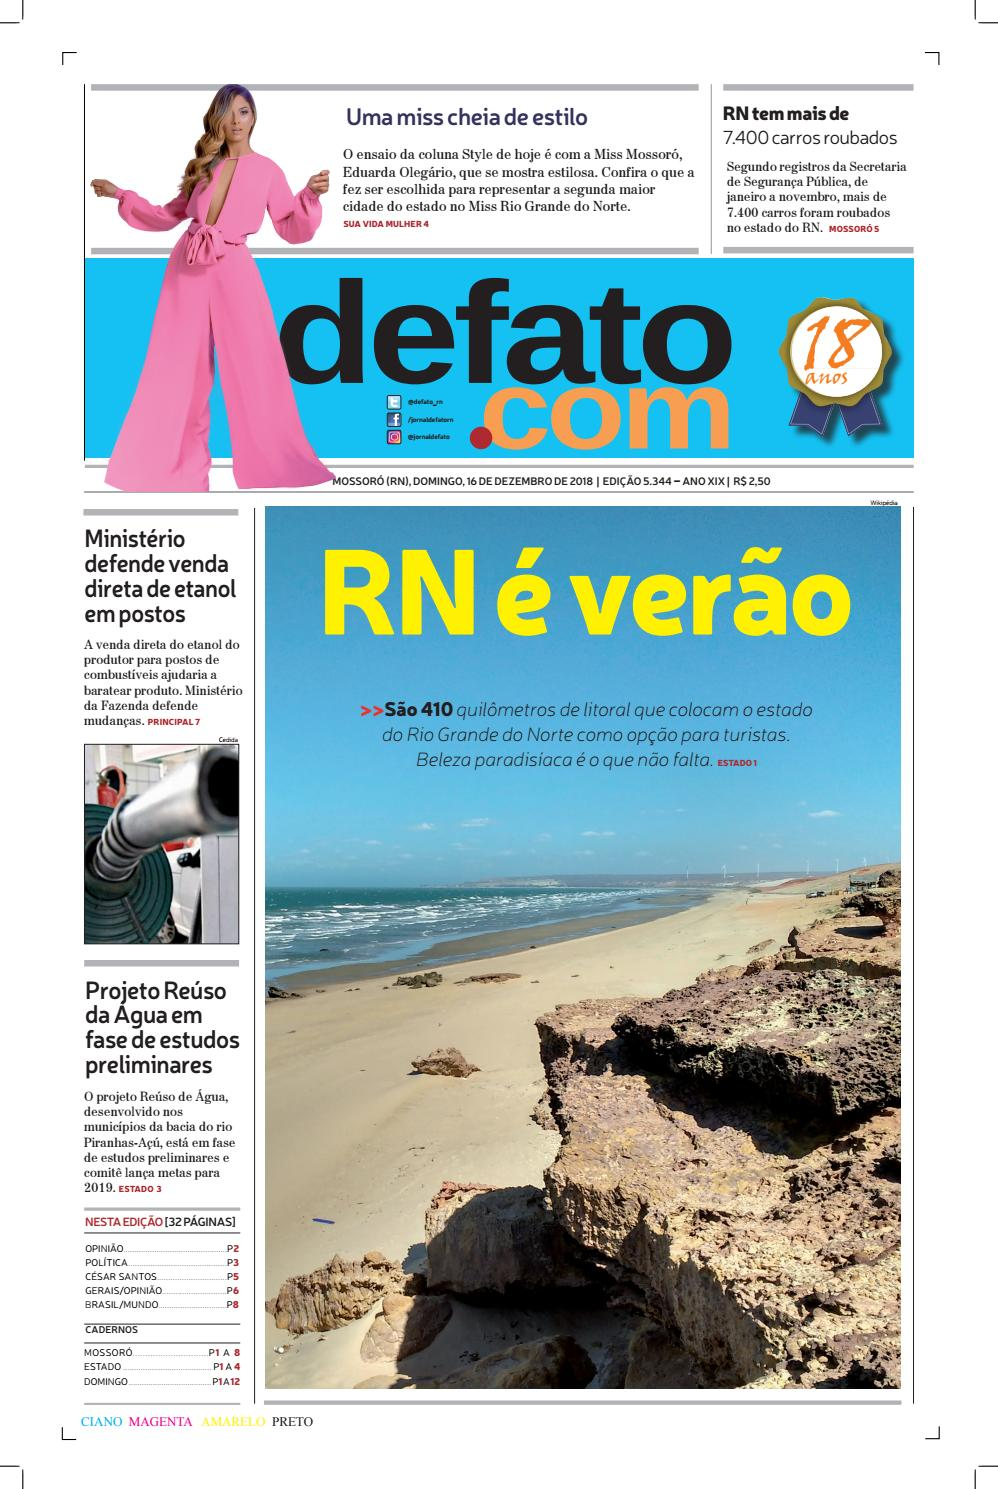 9b9e4642e6 Jornal de Fato by Jornal de Fato - issuu